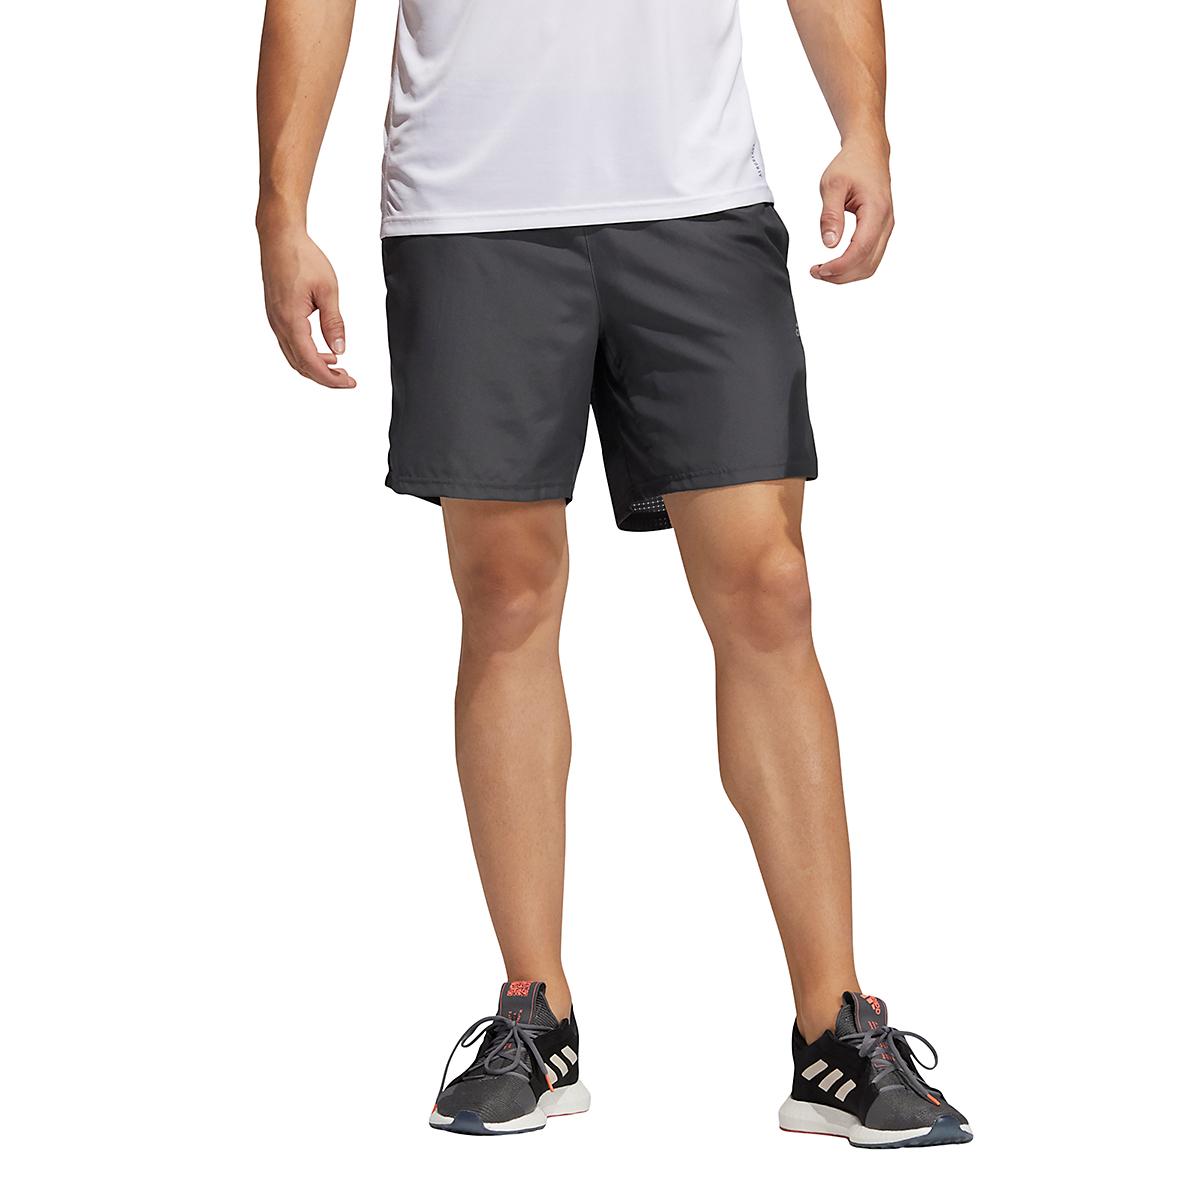 Men's Adidas Own The Run Shorts, , large, image 1